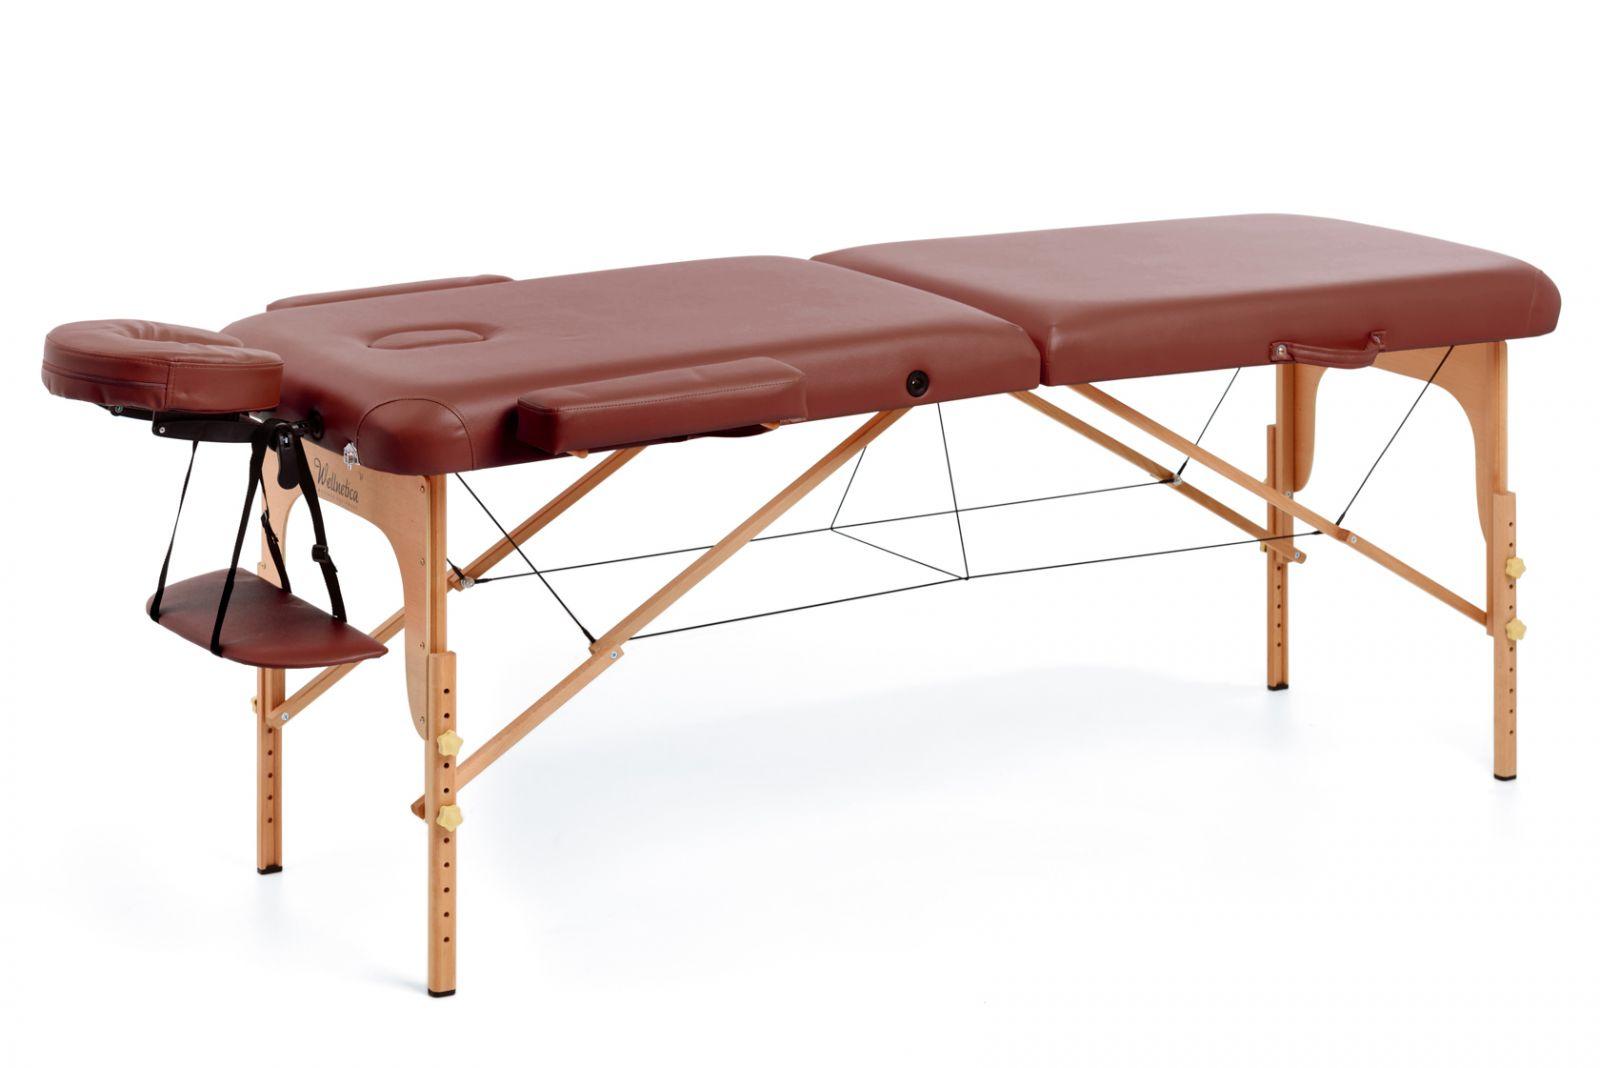 stol-za-masazu-libera-smeđa